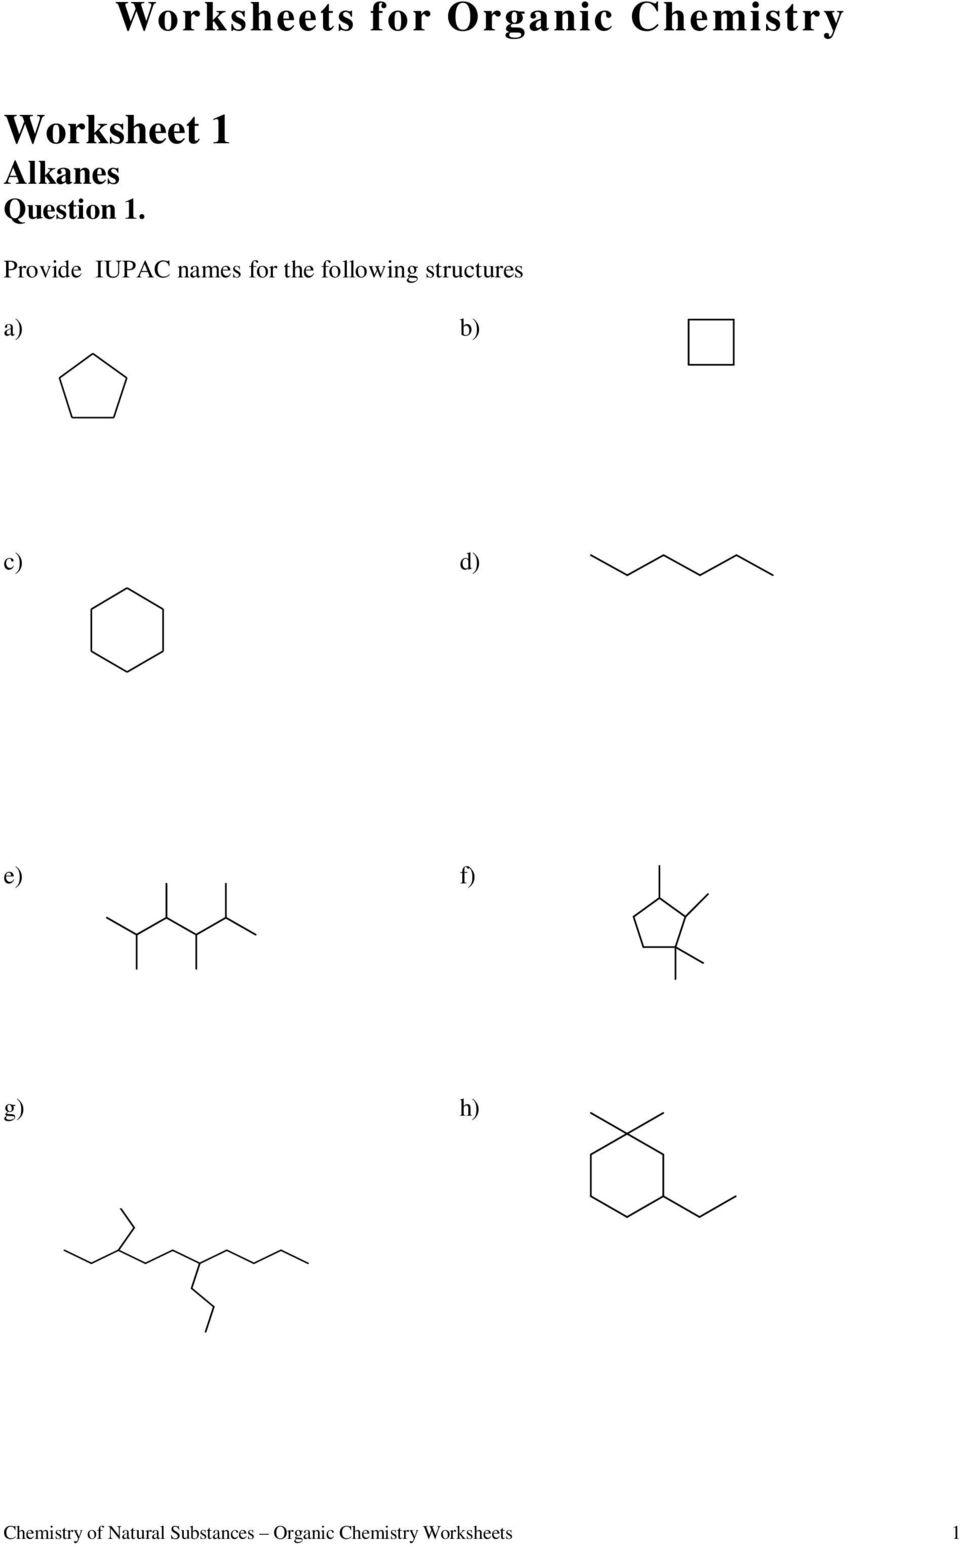 Worksheets. Worksheets For Organic Chemistry Worksheet 1